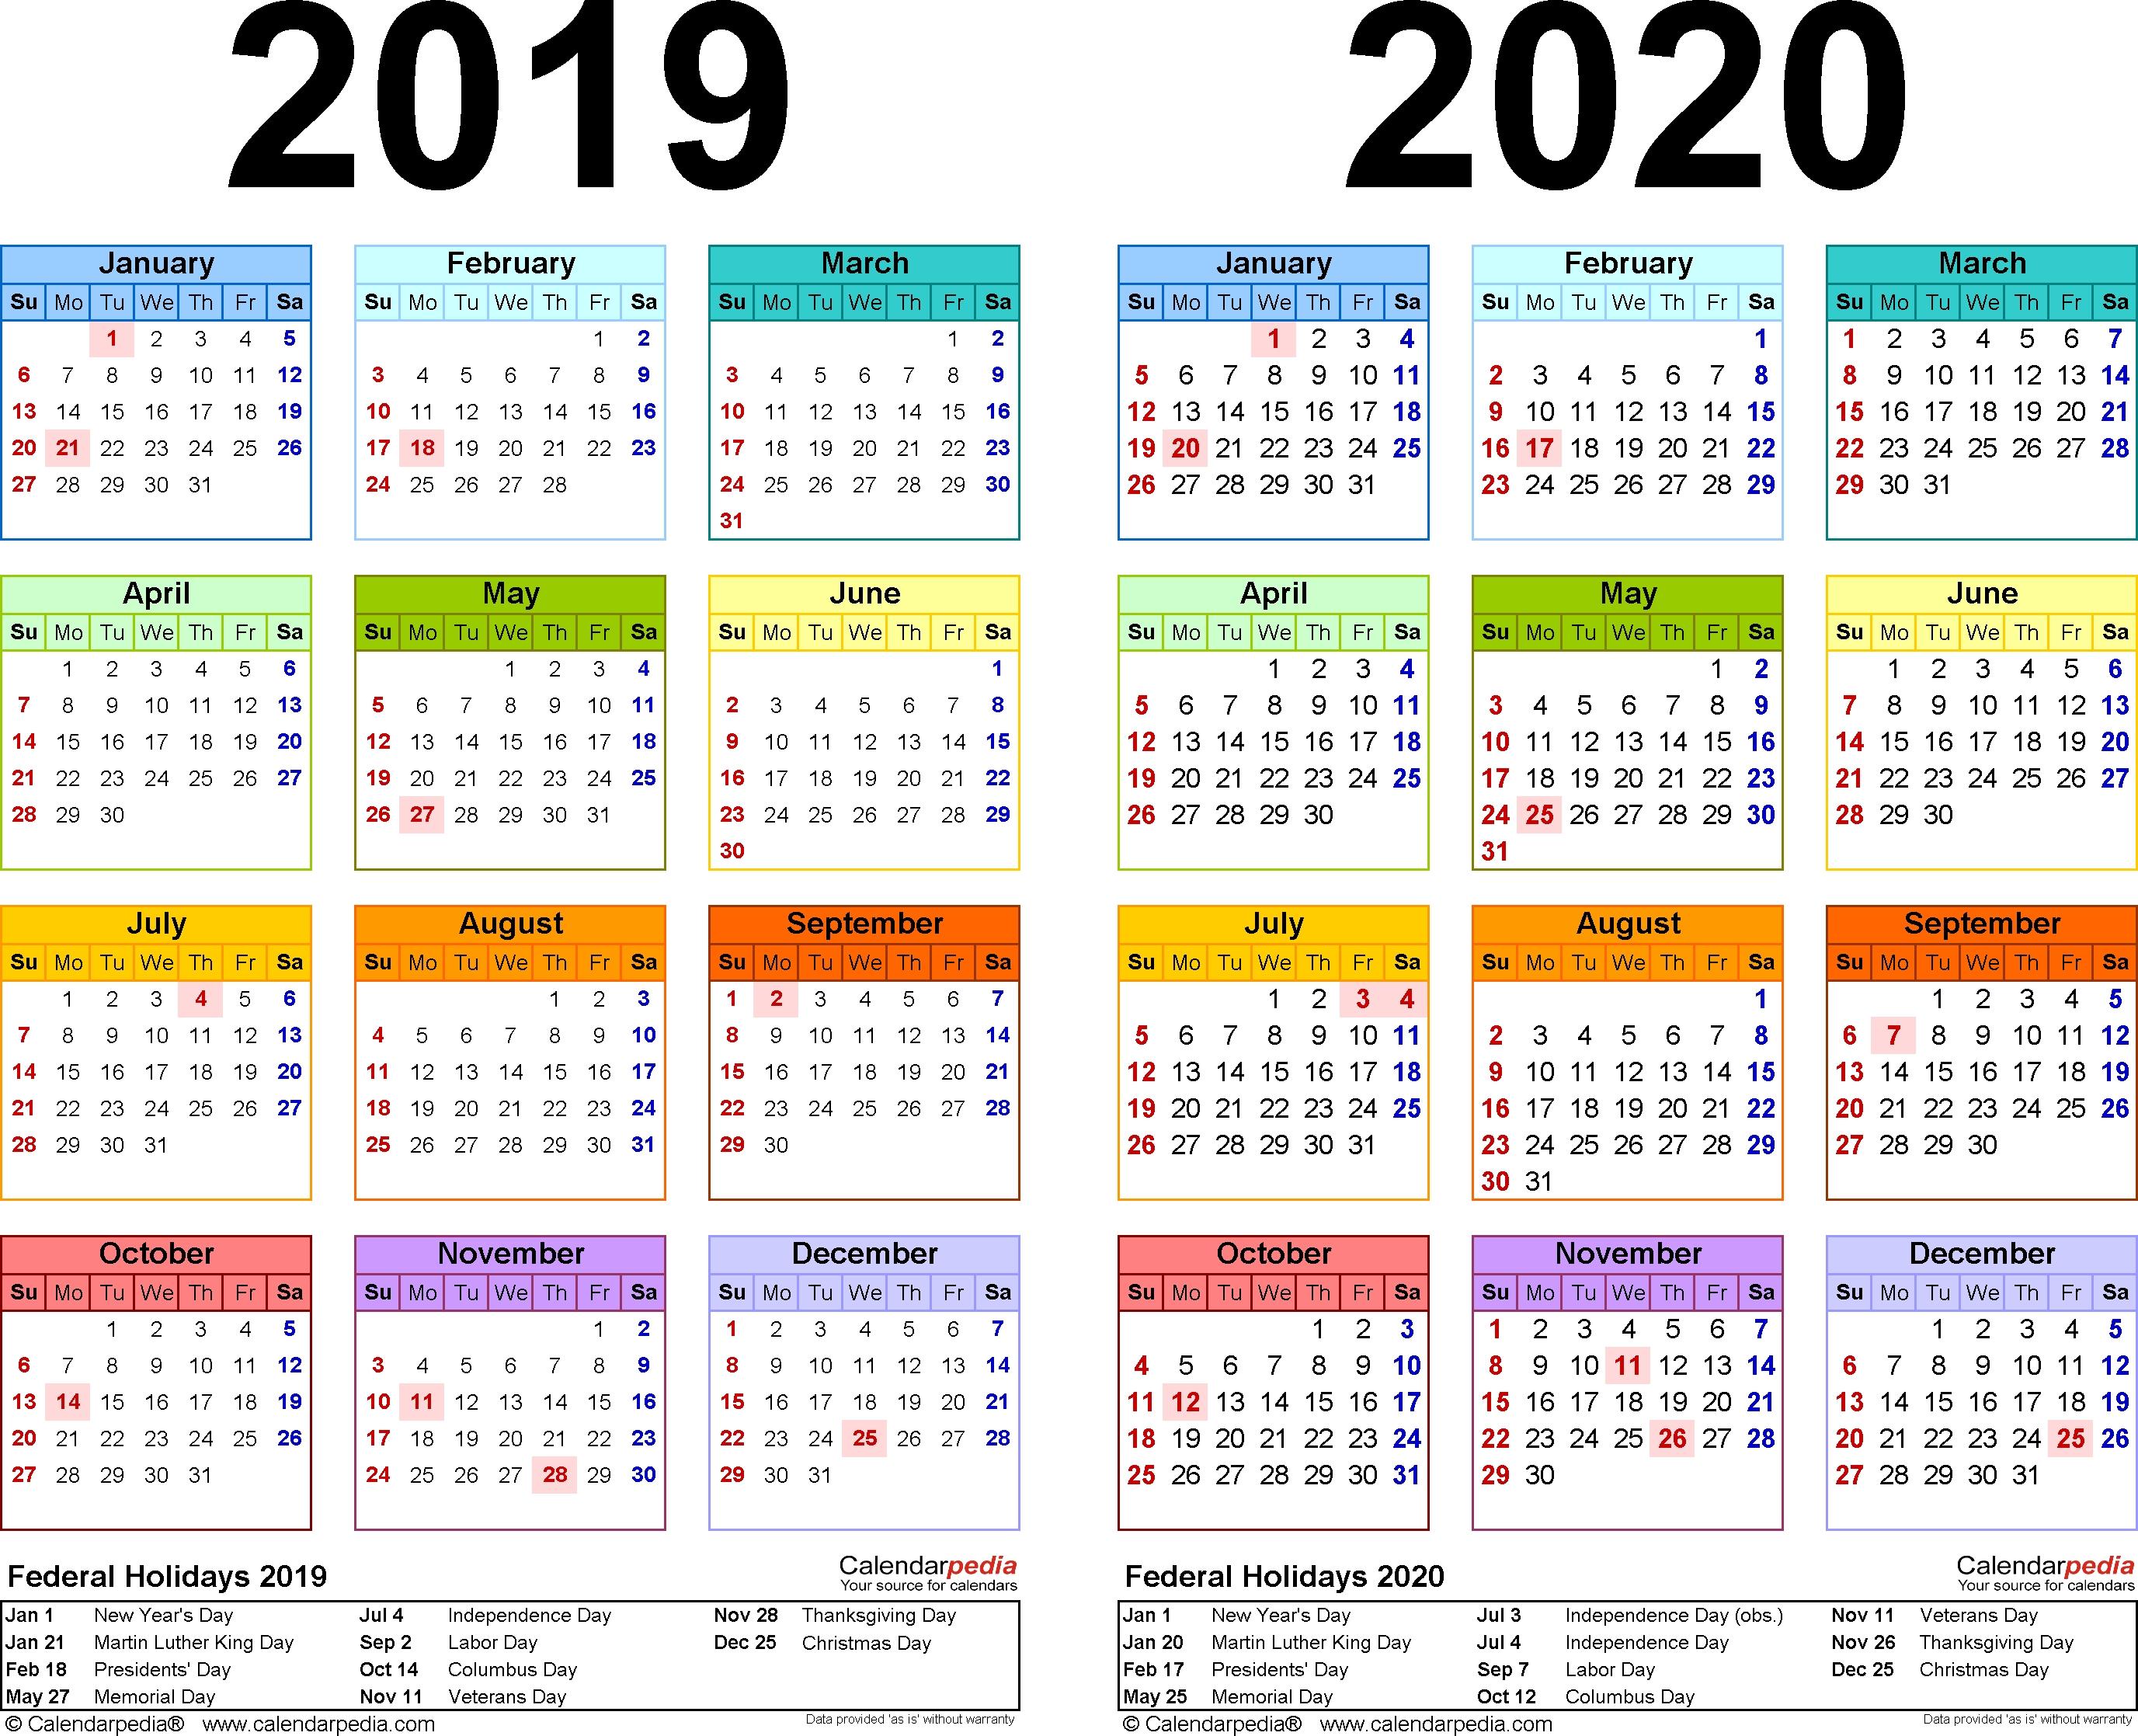 Printable Calendar For 2019 And 2020 | Printable Calendar 2019 for Large Print Free Printable Calendar 2020